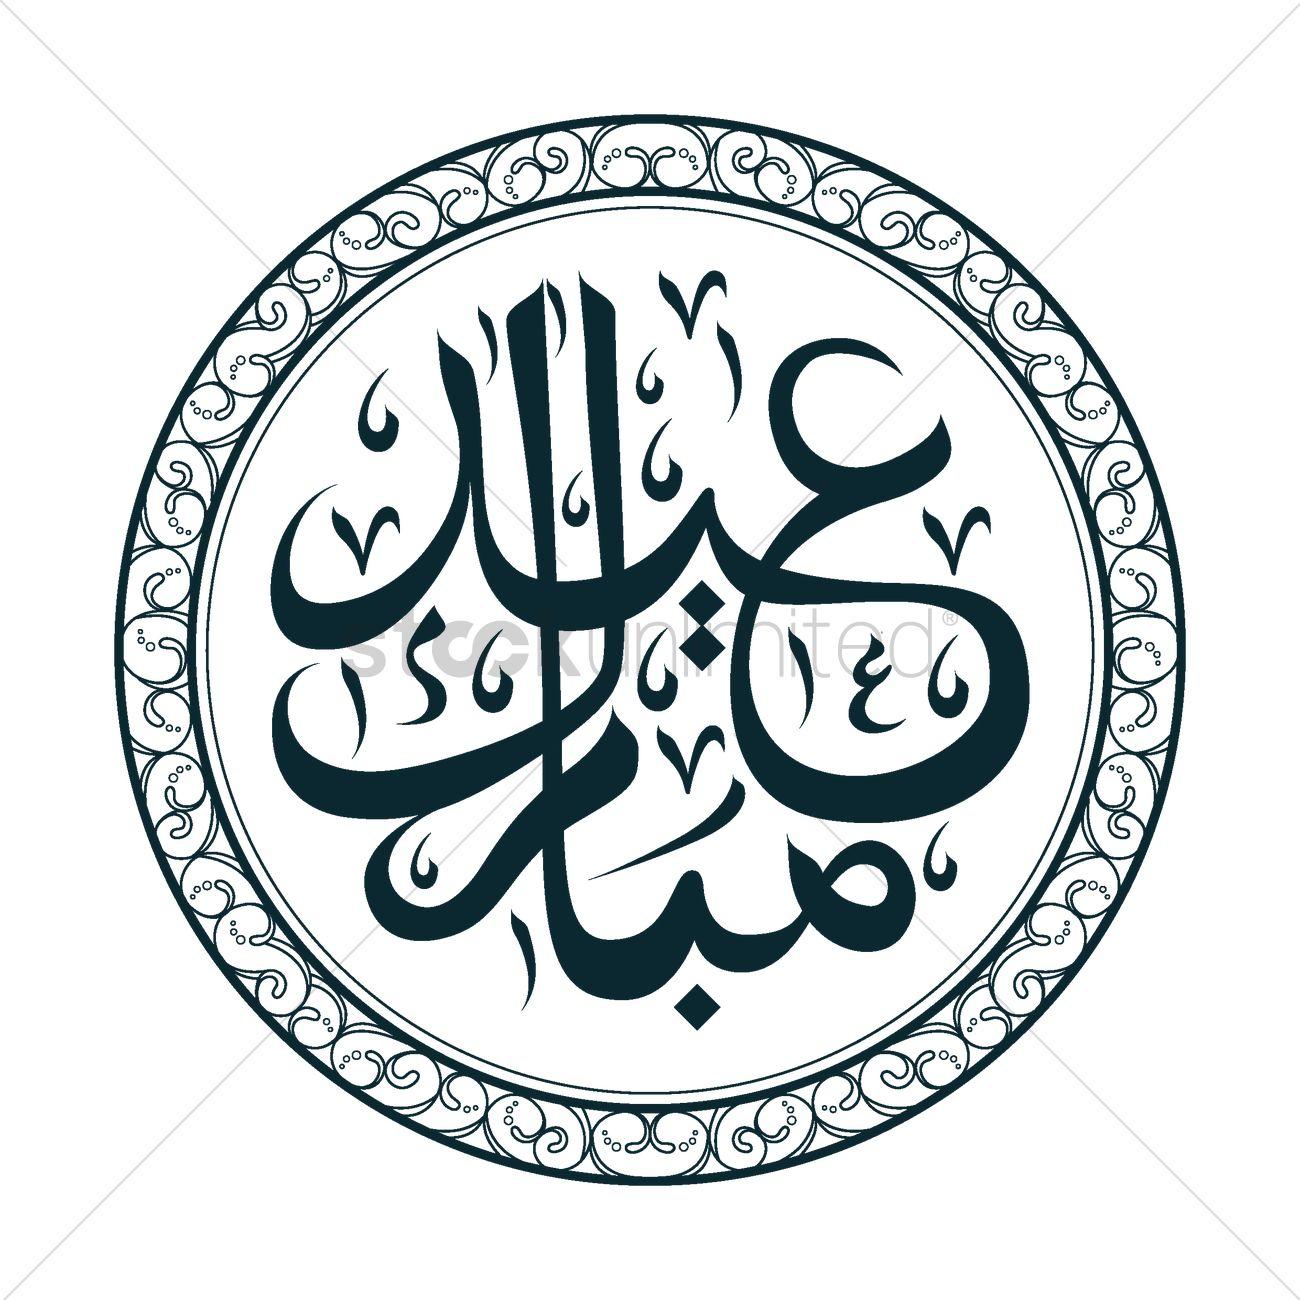 1300x1300 Eid Mubarak Greetings Vector Image